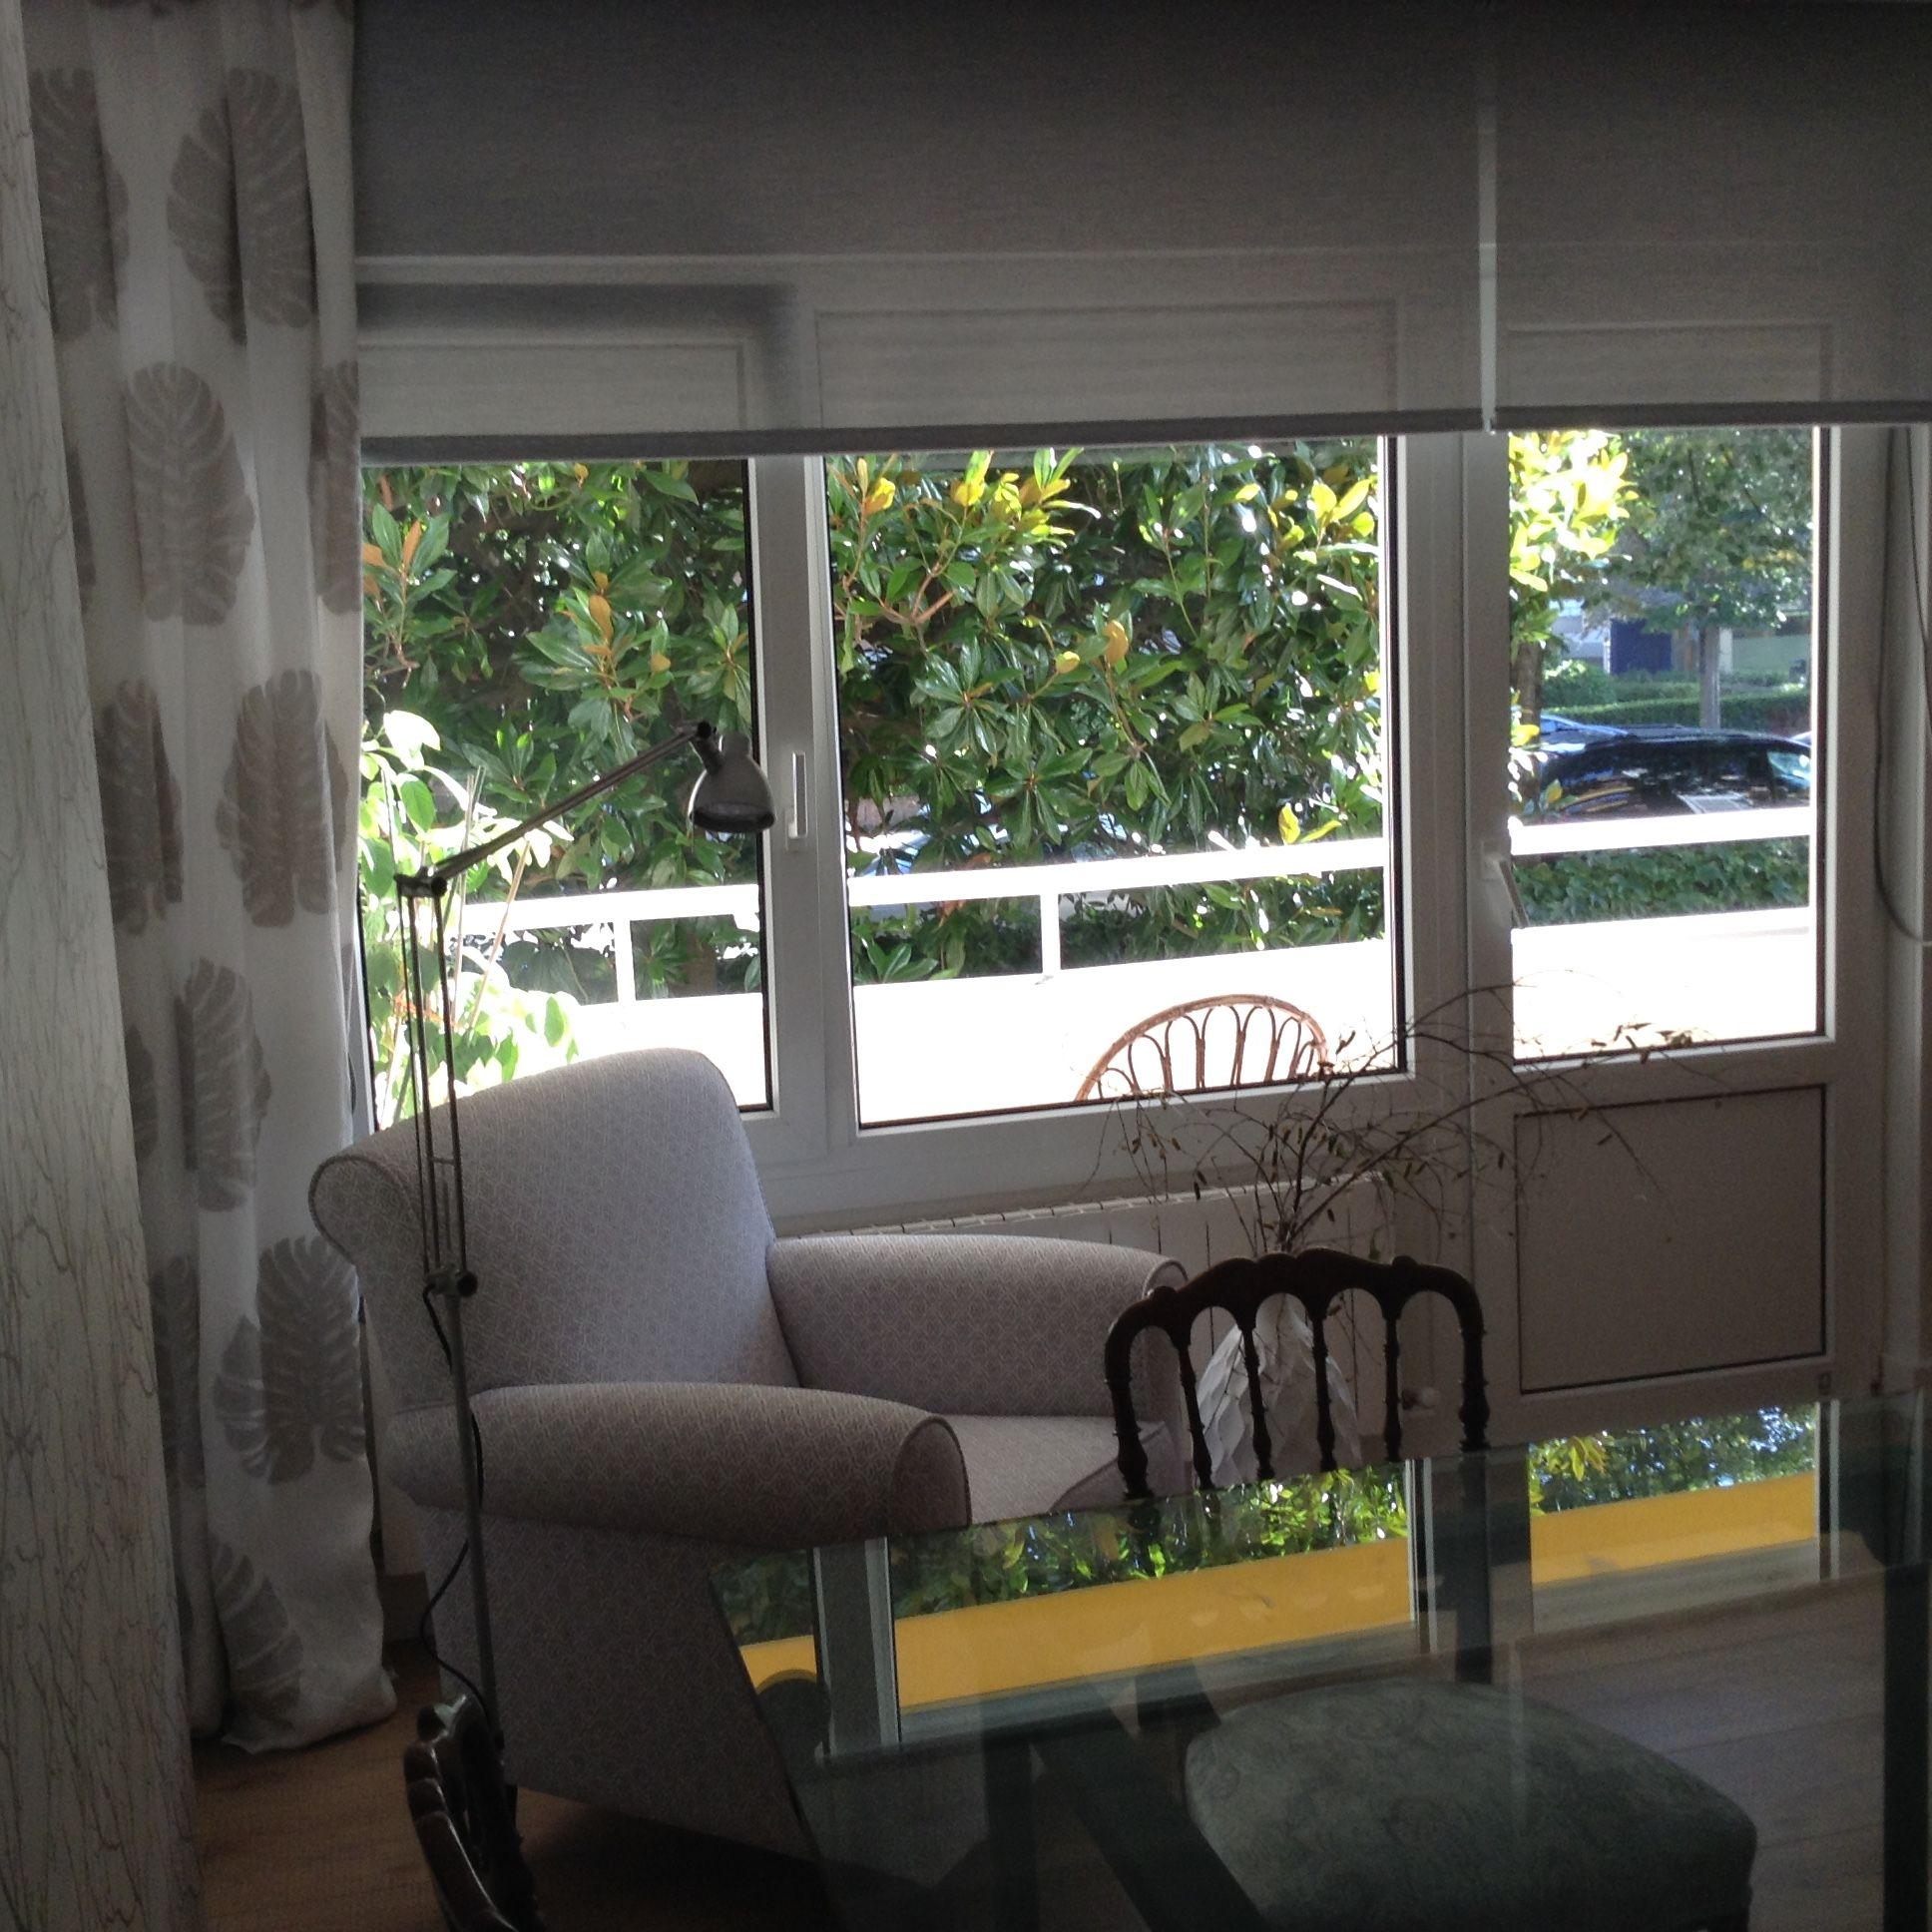 butaca tapizada, cortinas, screen. Ka Zarautz